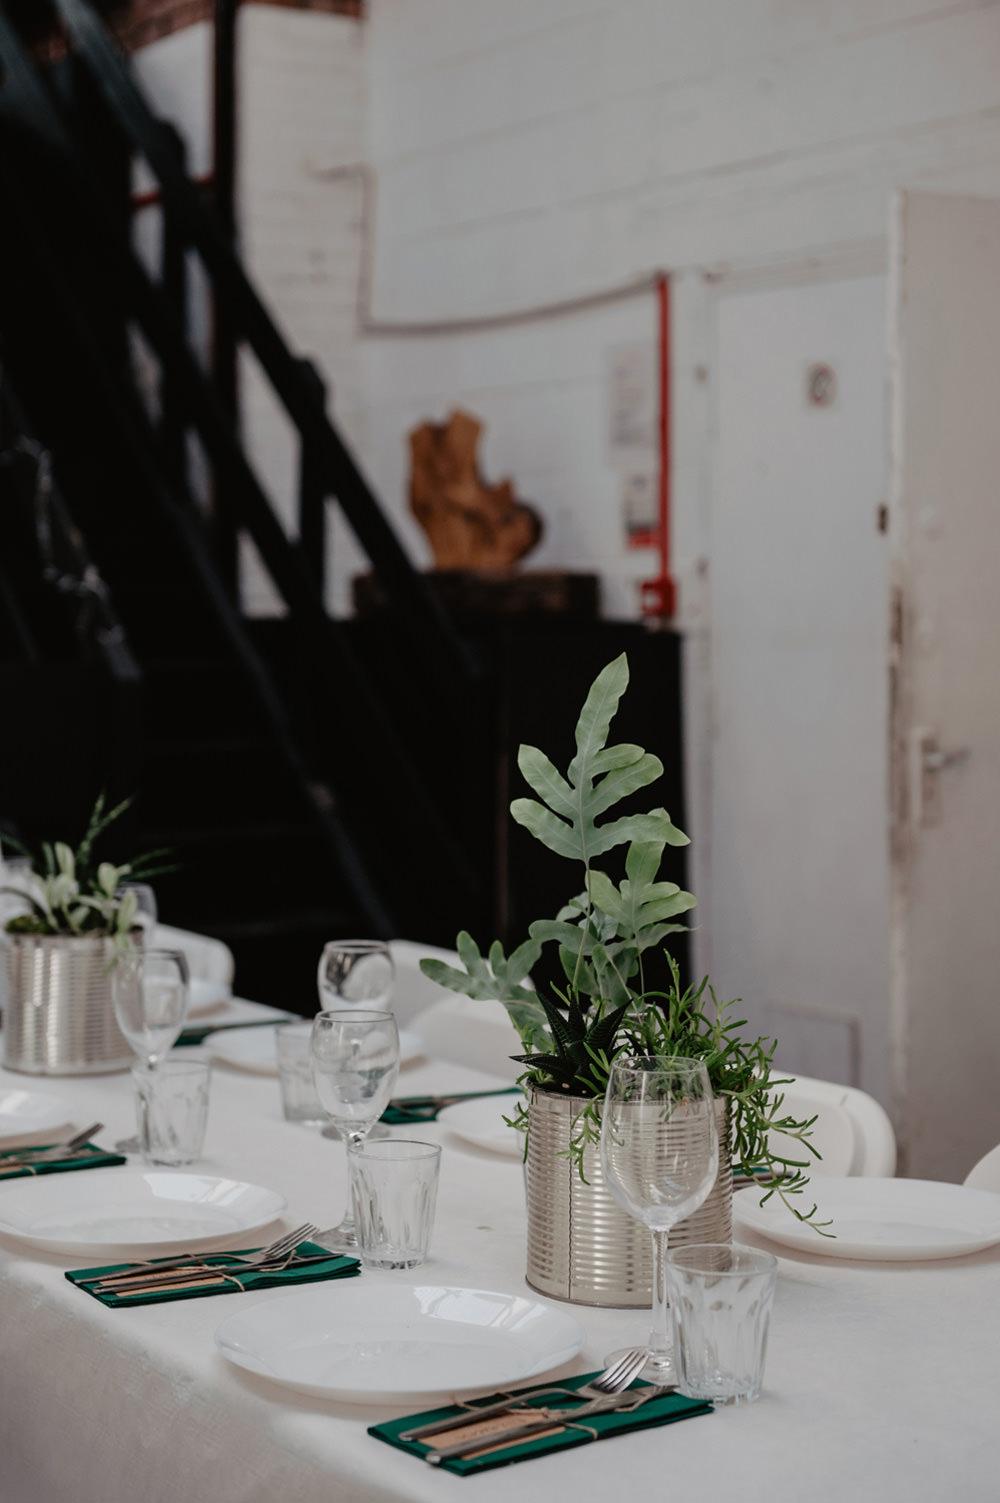 Cactus Cacti Succulent Tin Can Centrepiece Decor Table Stour Space Wedding Anne Schwarz Photography